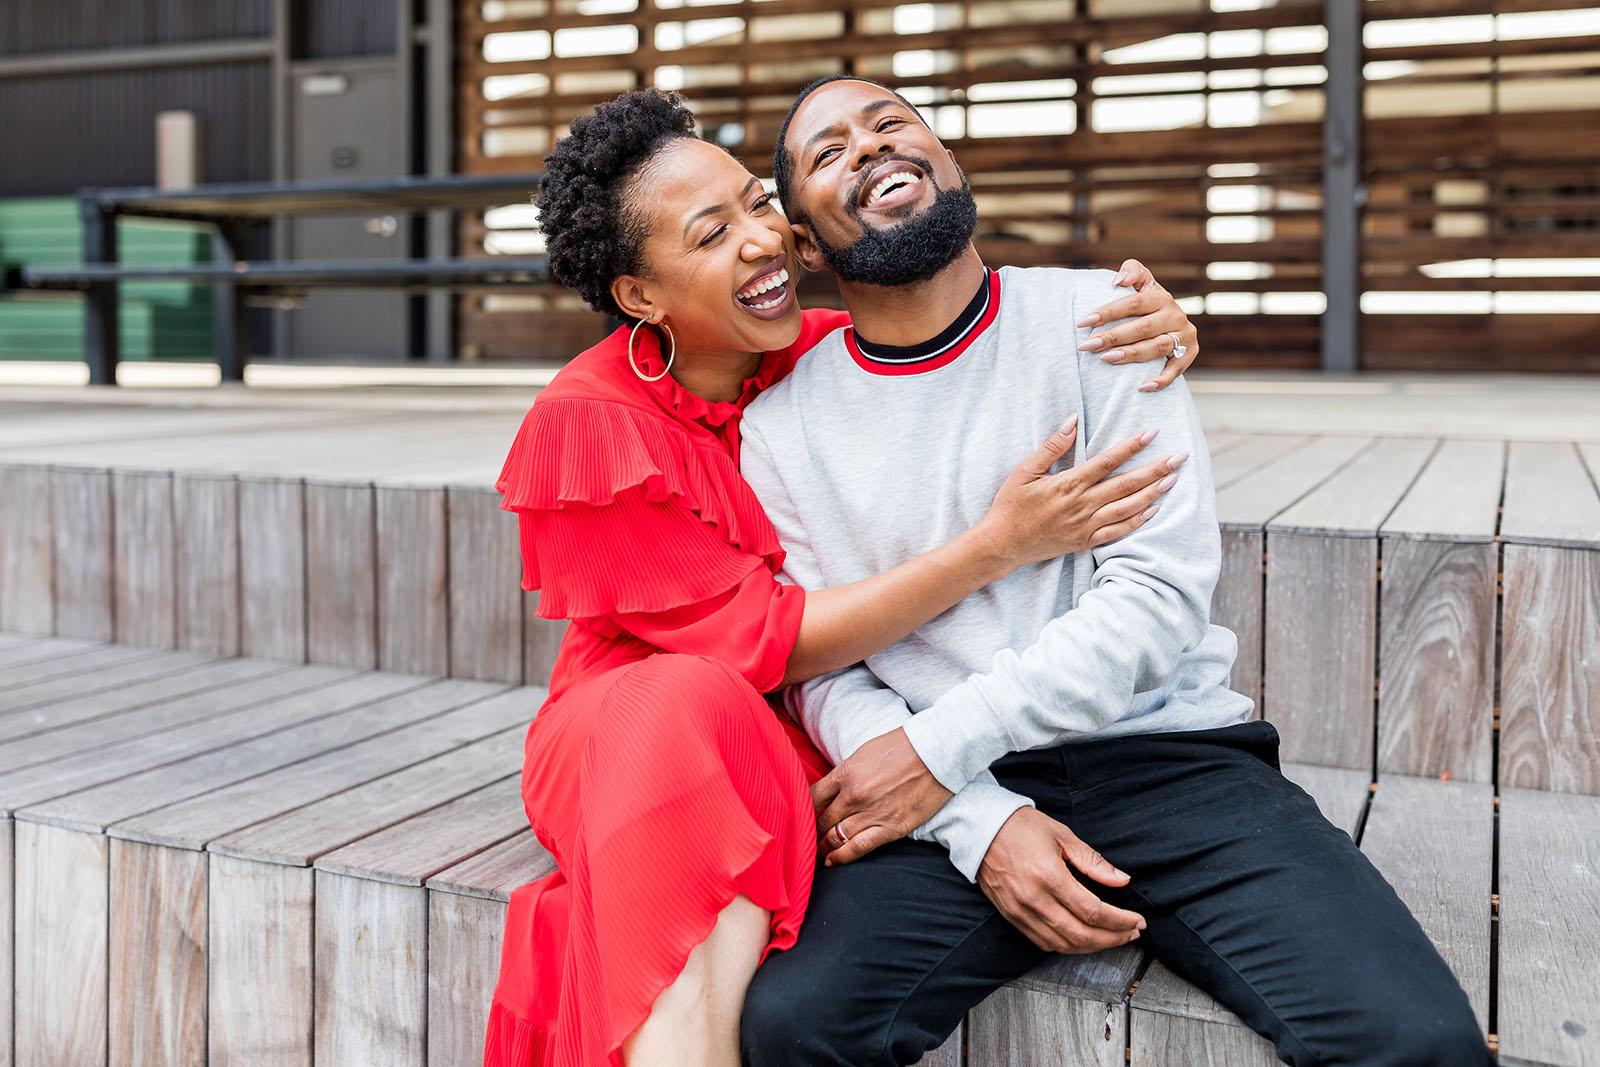 A couple laughs on city steps